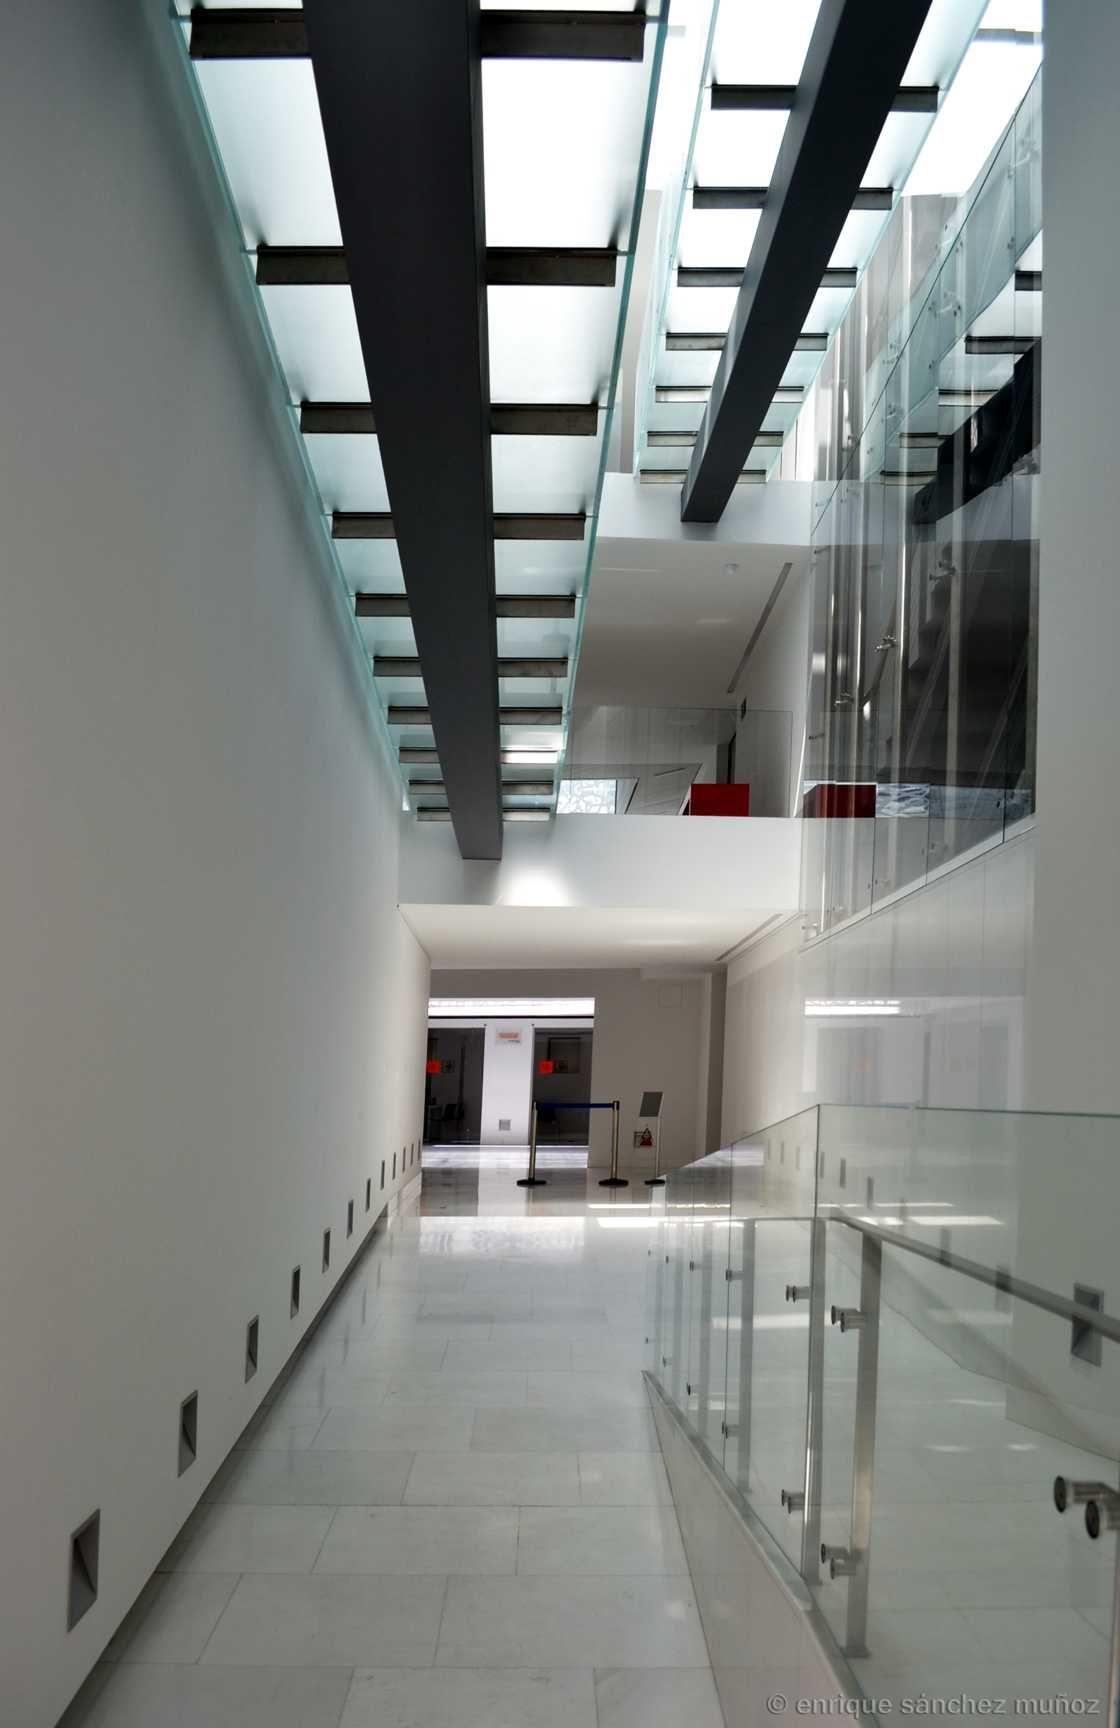 Colegio de arquitectos de toledo spain pasarelas de vidrio glass walkways arq antonio - Colegio arquitectos toledo ...